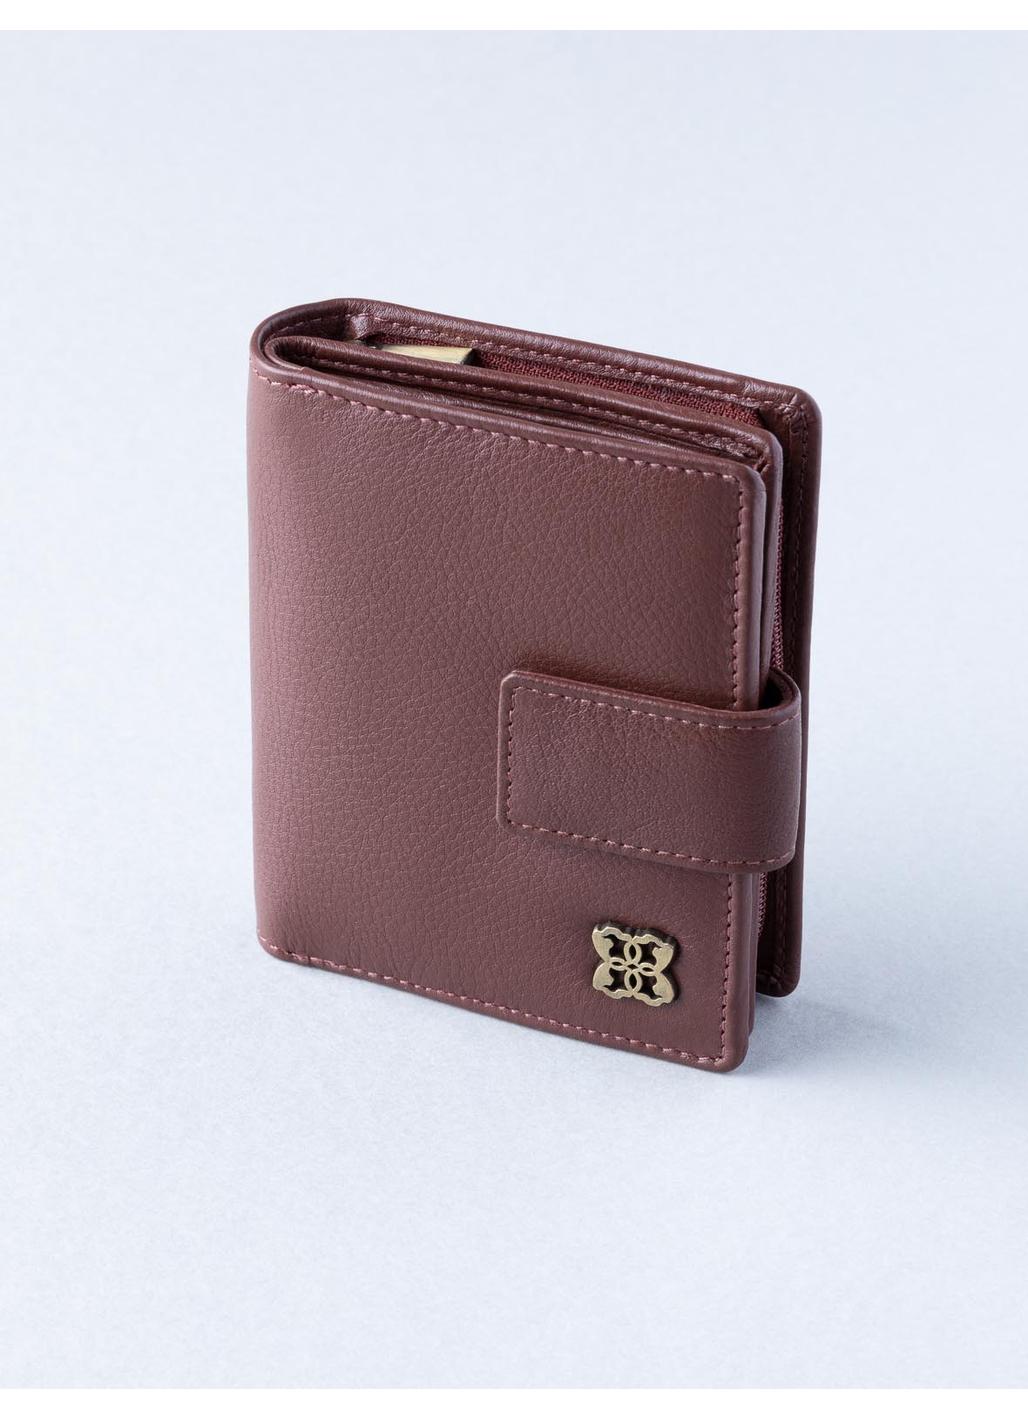 Rickerby 12cm Leather Purse in Chestnut Brown